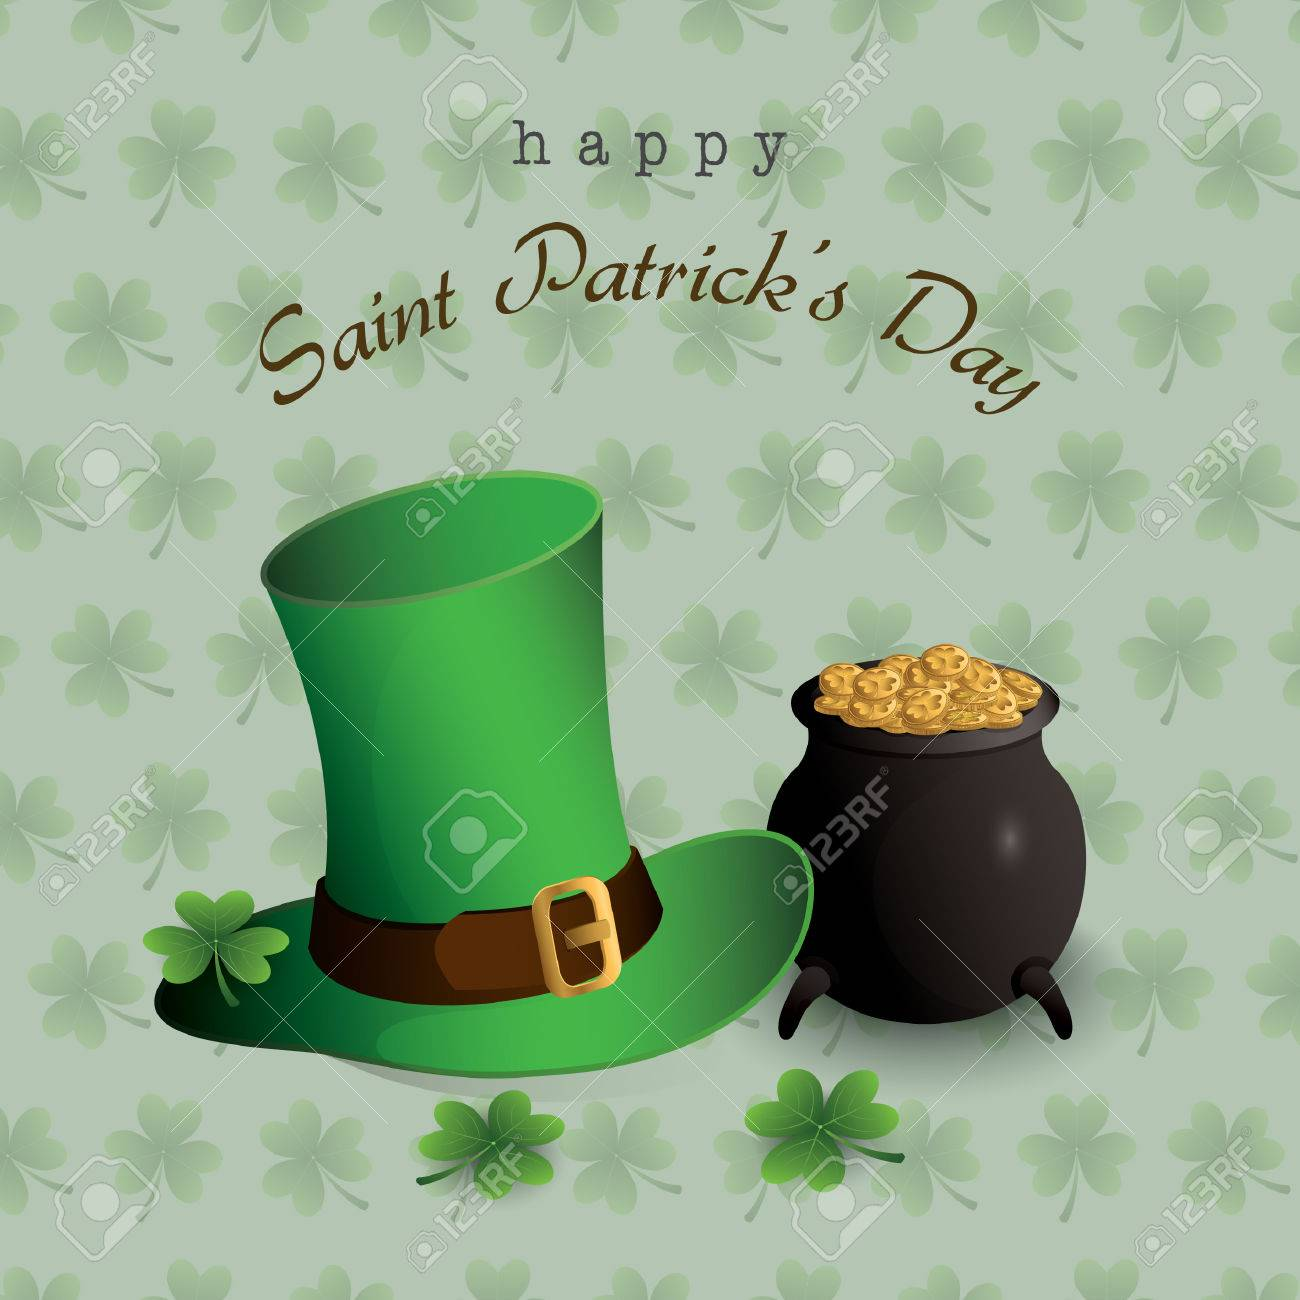 Happy St Patrick S Day Wallpaper Royalty Free Cliparts Vectors